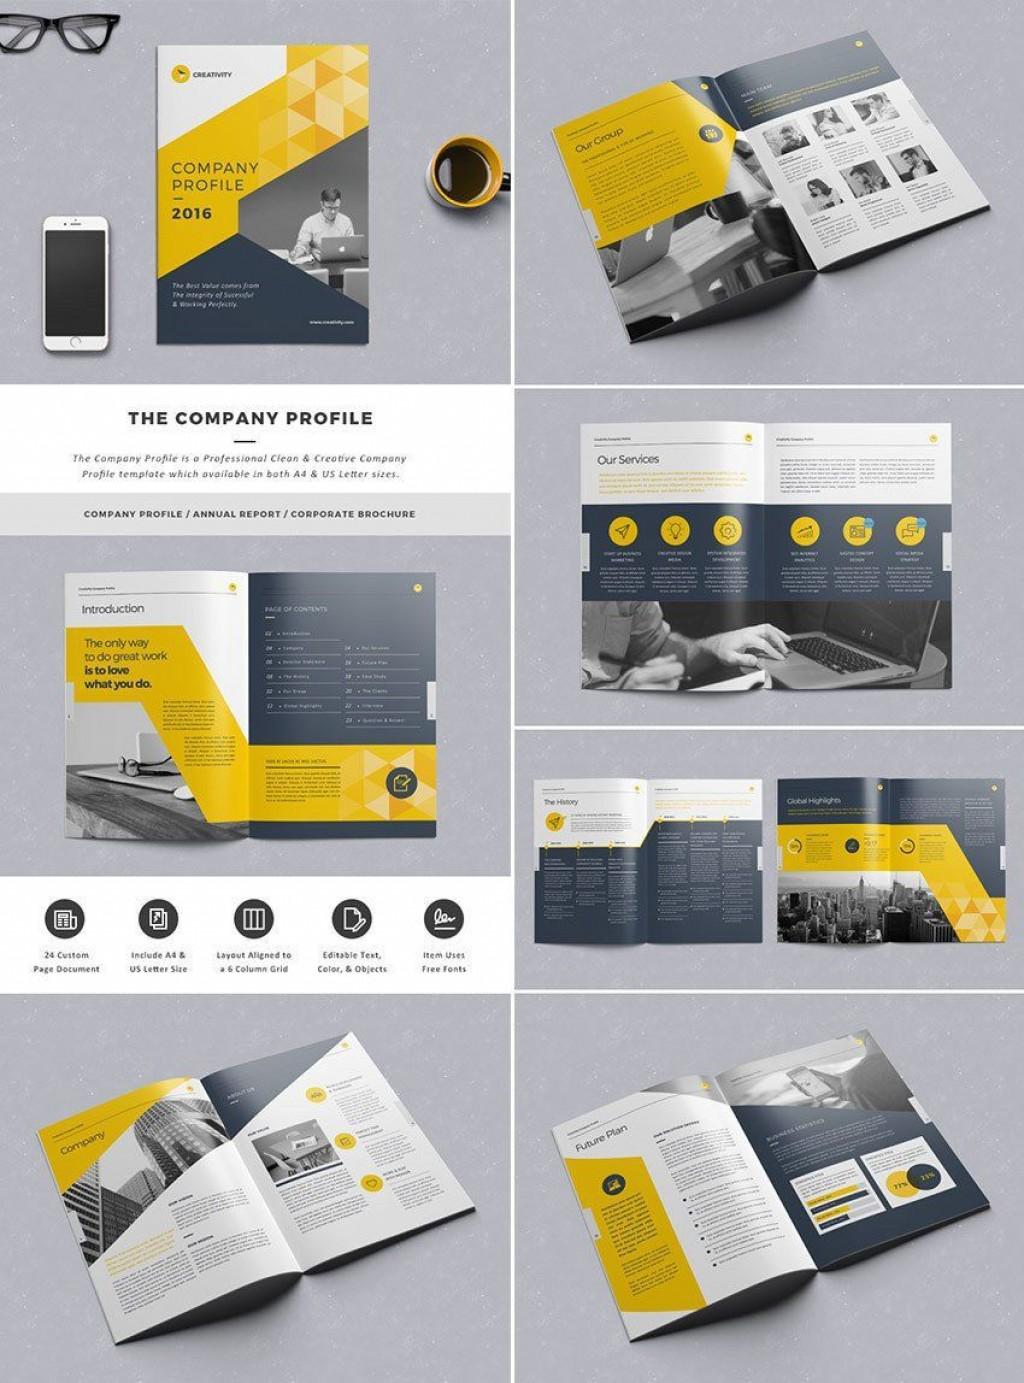 000 Simple Indesign Brochure Template Free Picture  Adobe Download Bi Fold BusinesLarge